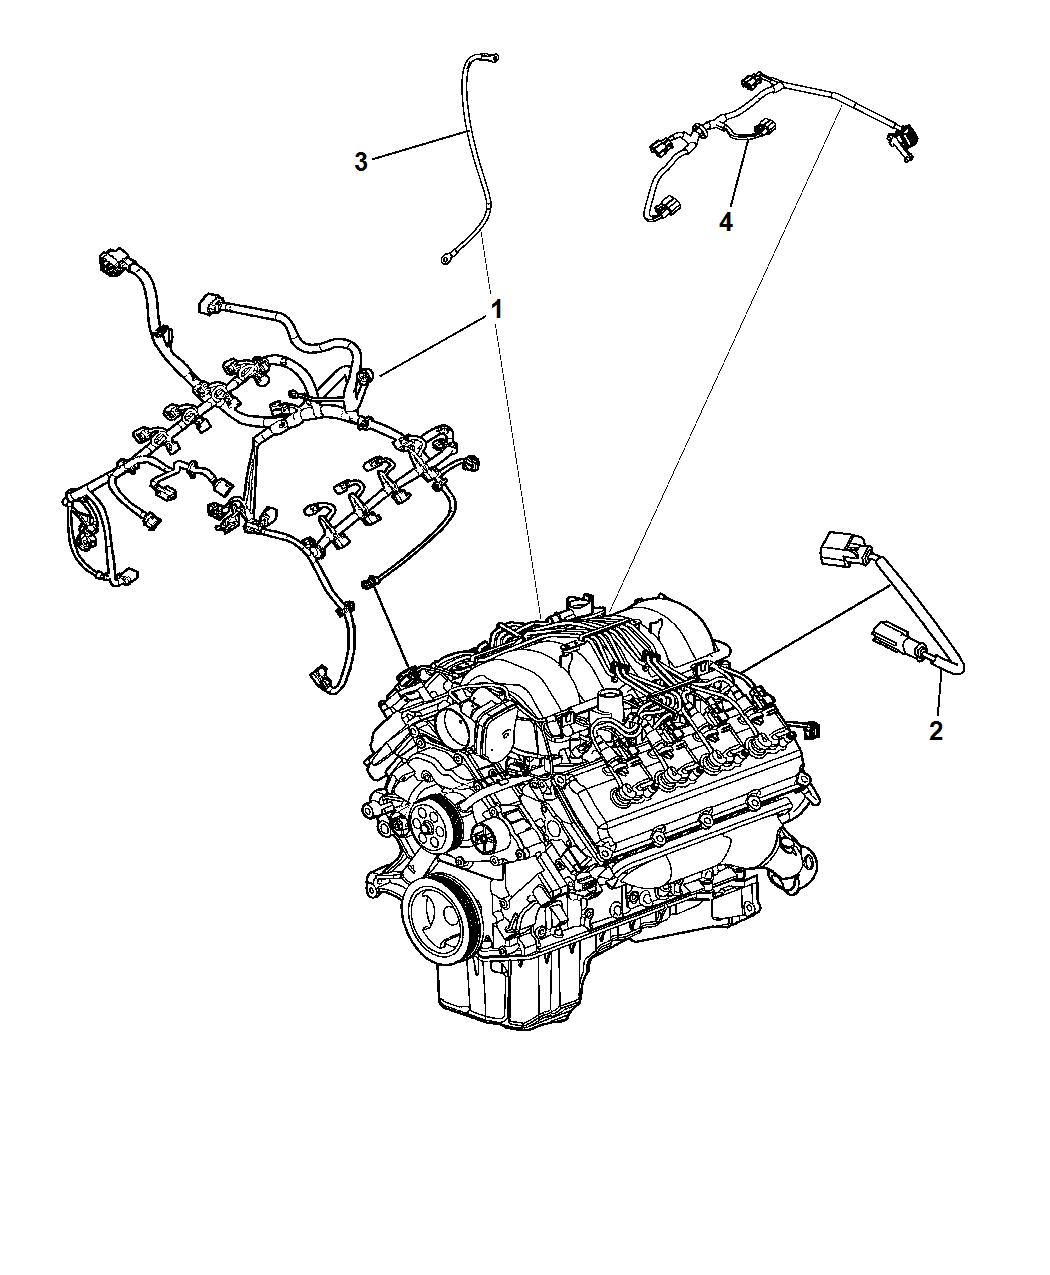 [SCHEMATICS_48IU]  NX_3652] 08 Dodge Charger Engine Diagram Schematic Wiring | 2008 2 7 V6 Chrysler Engine Diagram |  | Vira Subd Lite Tixat Rosz Trons Mohammedshrine Librar Wiring 101